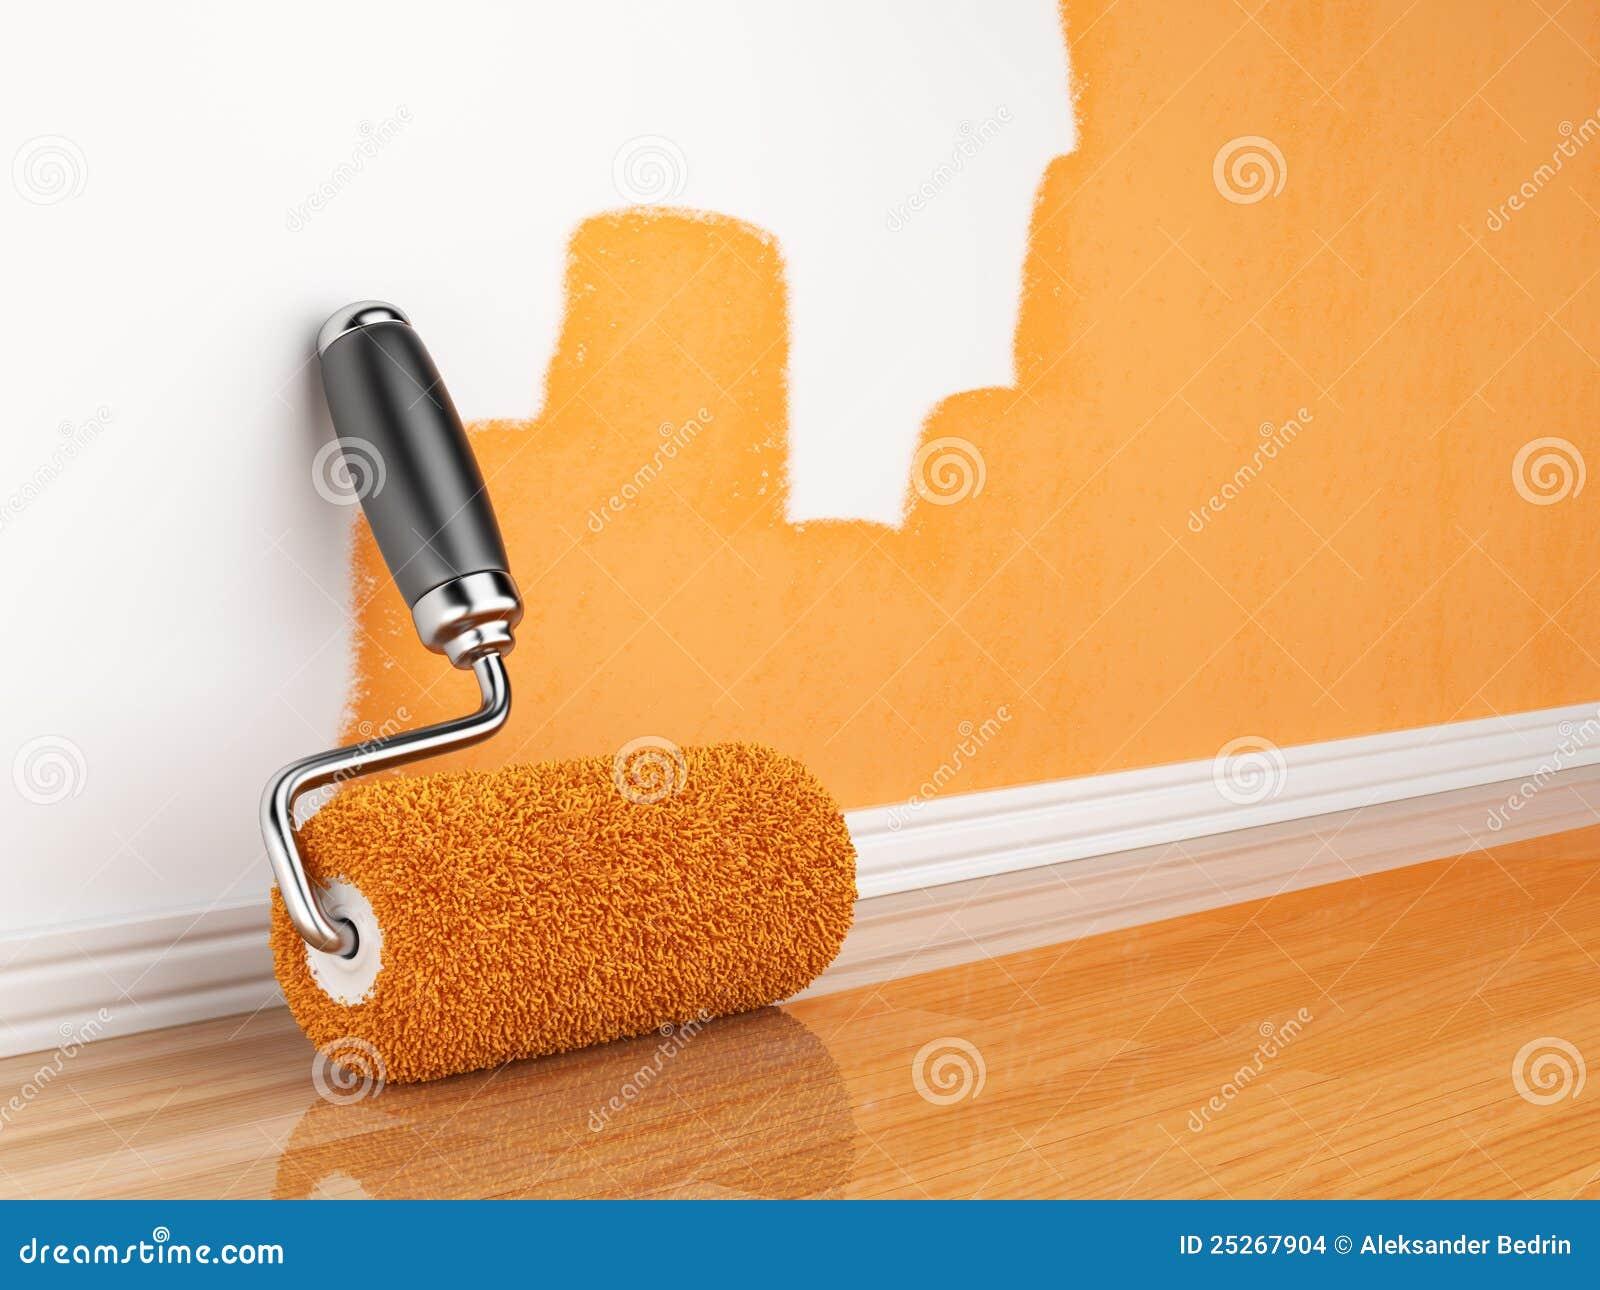 Tom home målningsrenoveringvägg